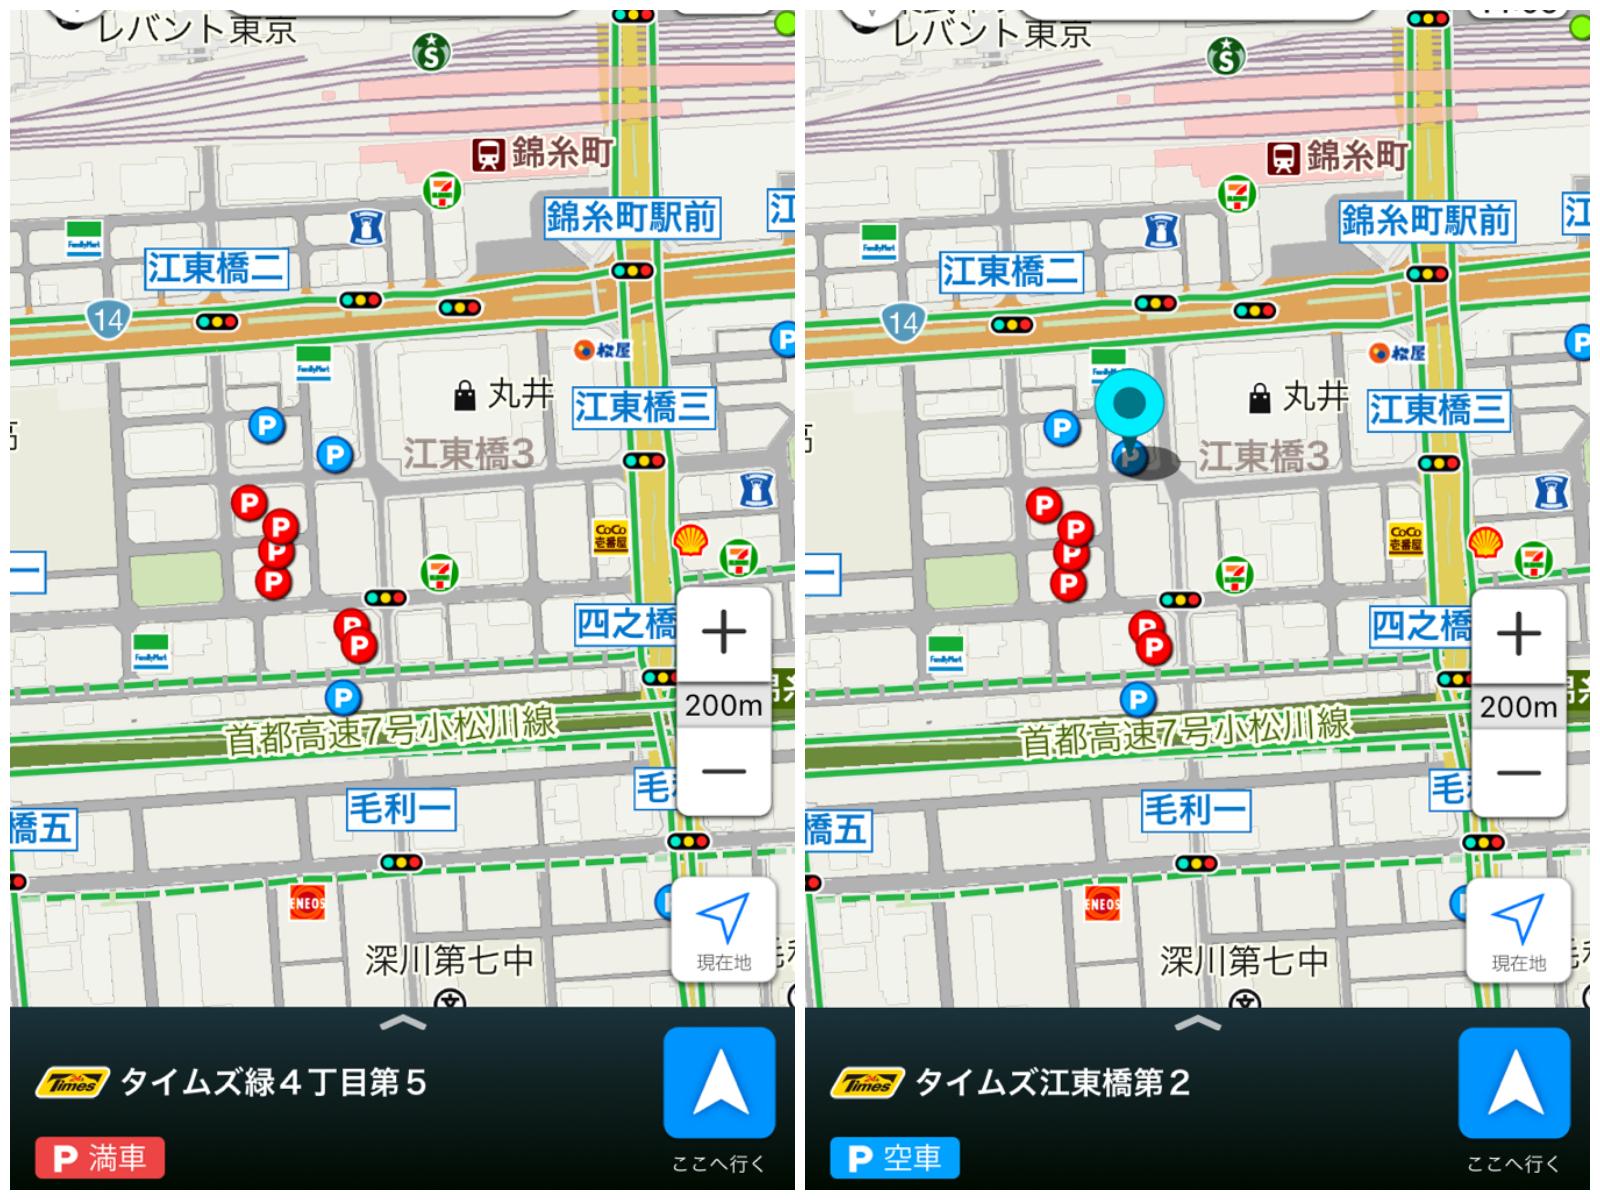 Yahoo!カーナビ 駐車場空き情報